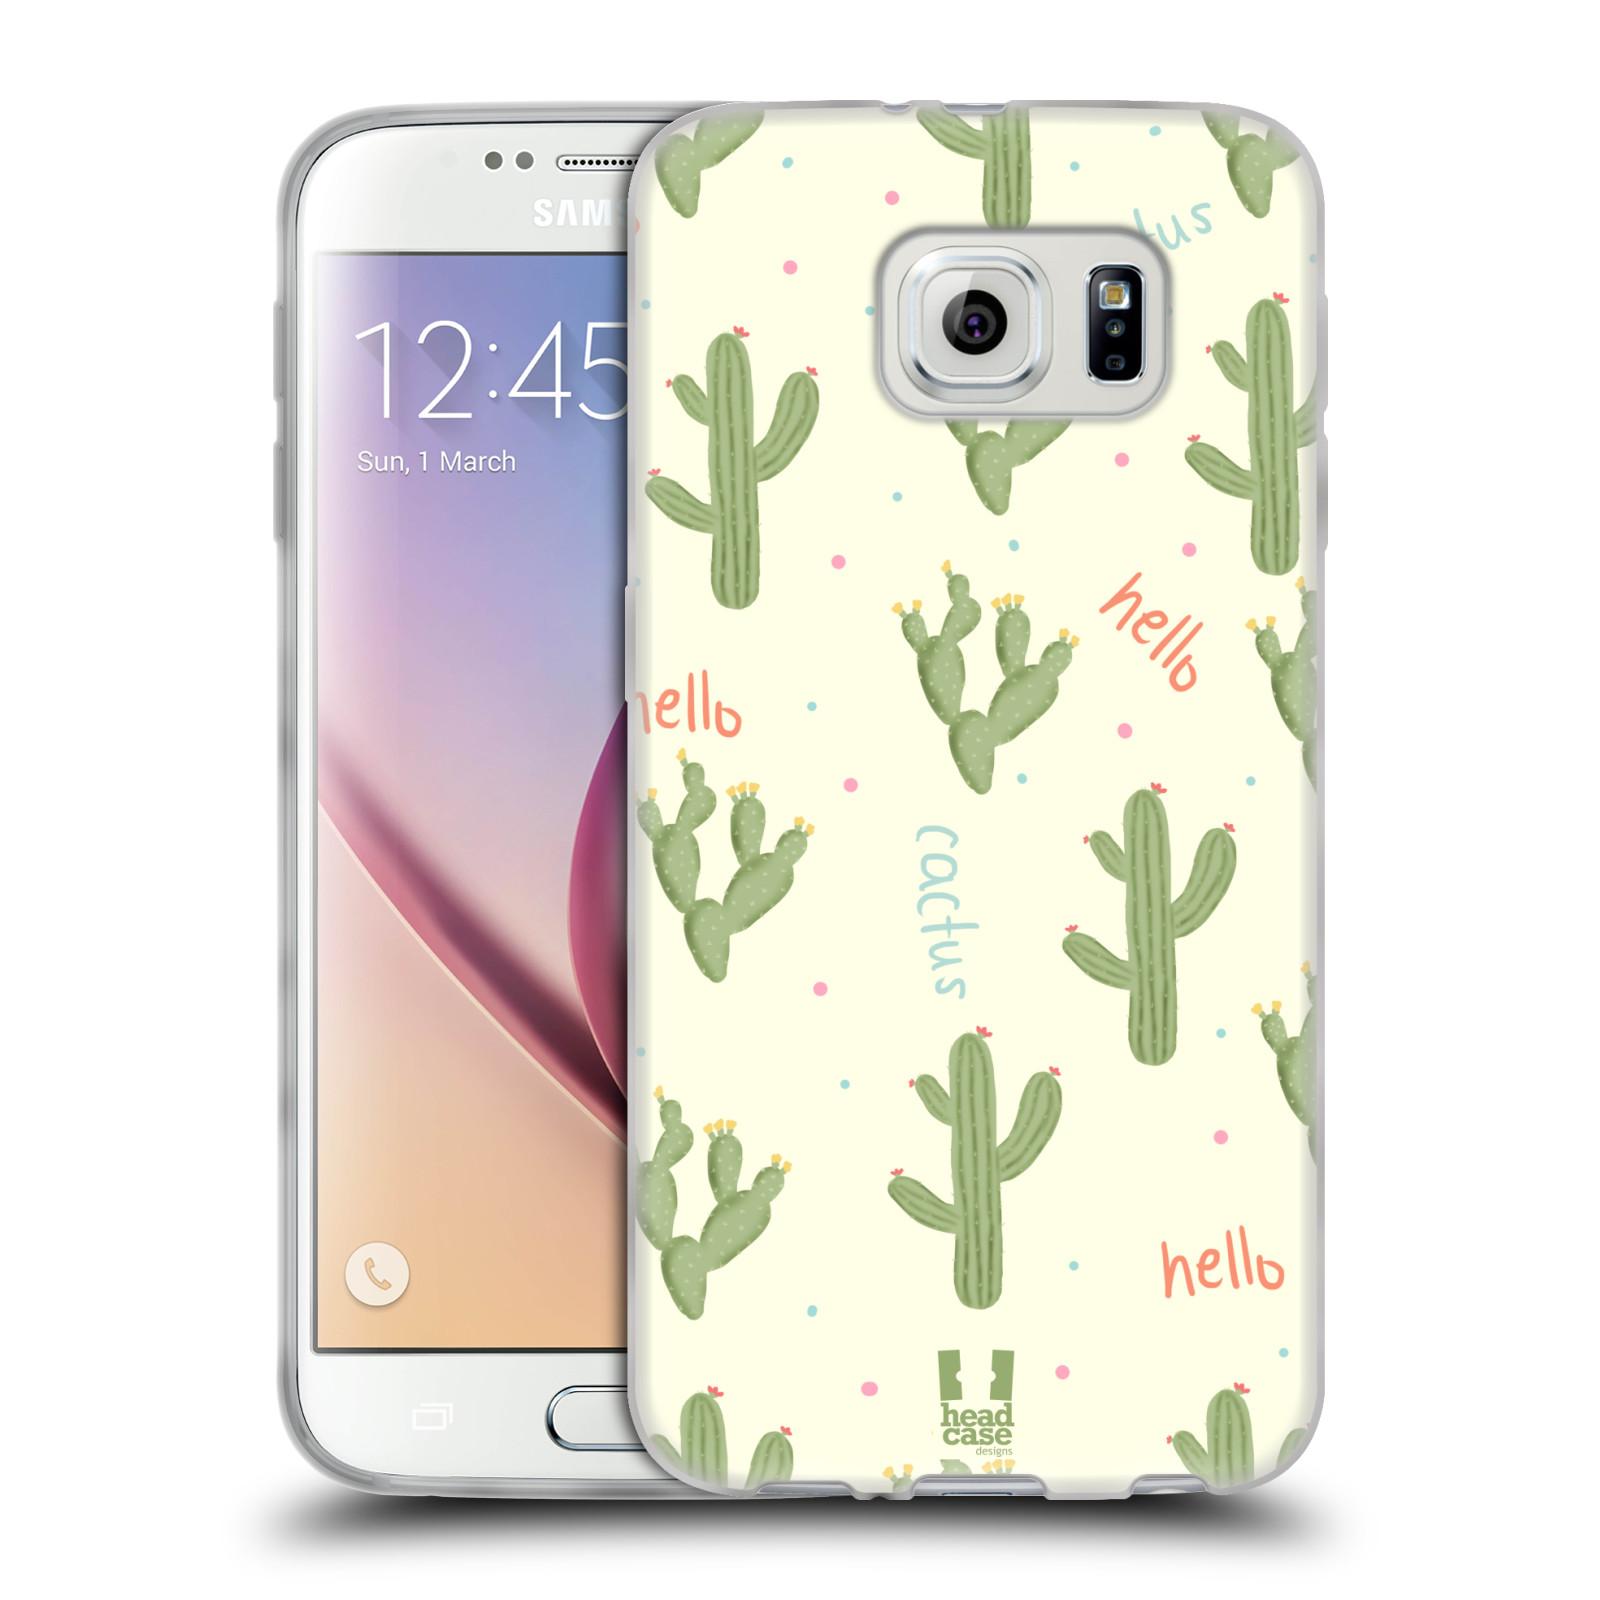 HEAD CASE DESIGNS EVERYTHING PASTELS SOFT GEL CASE FOR SAMSUNG PHONES 1